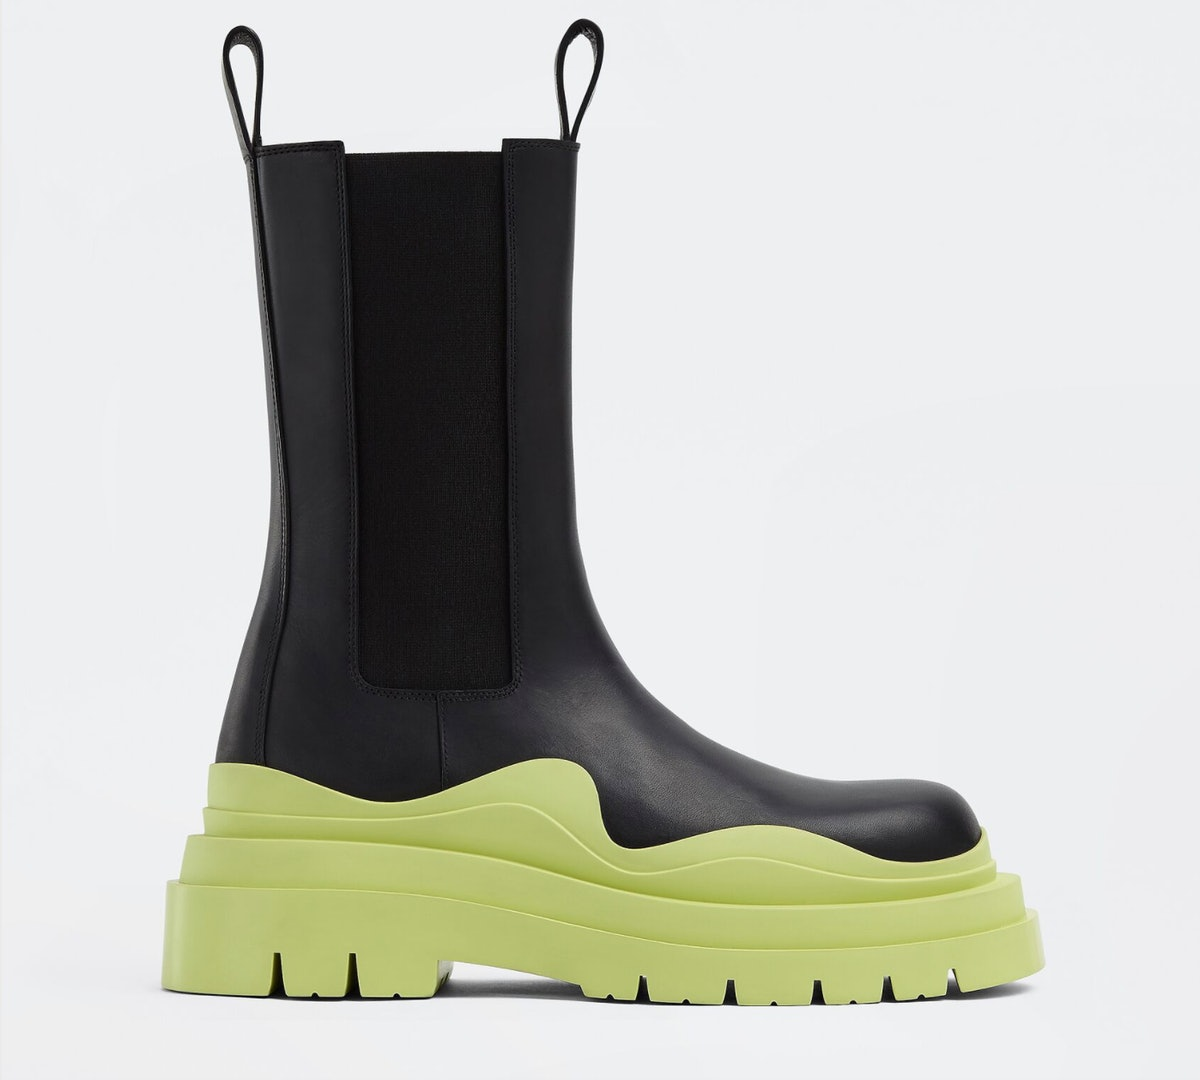 Bottega Veneta's black Chelsea boots with yellow tire inspired soles.